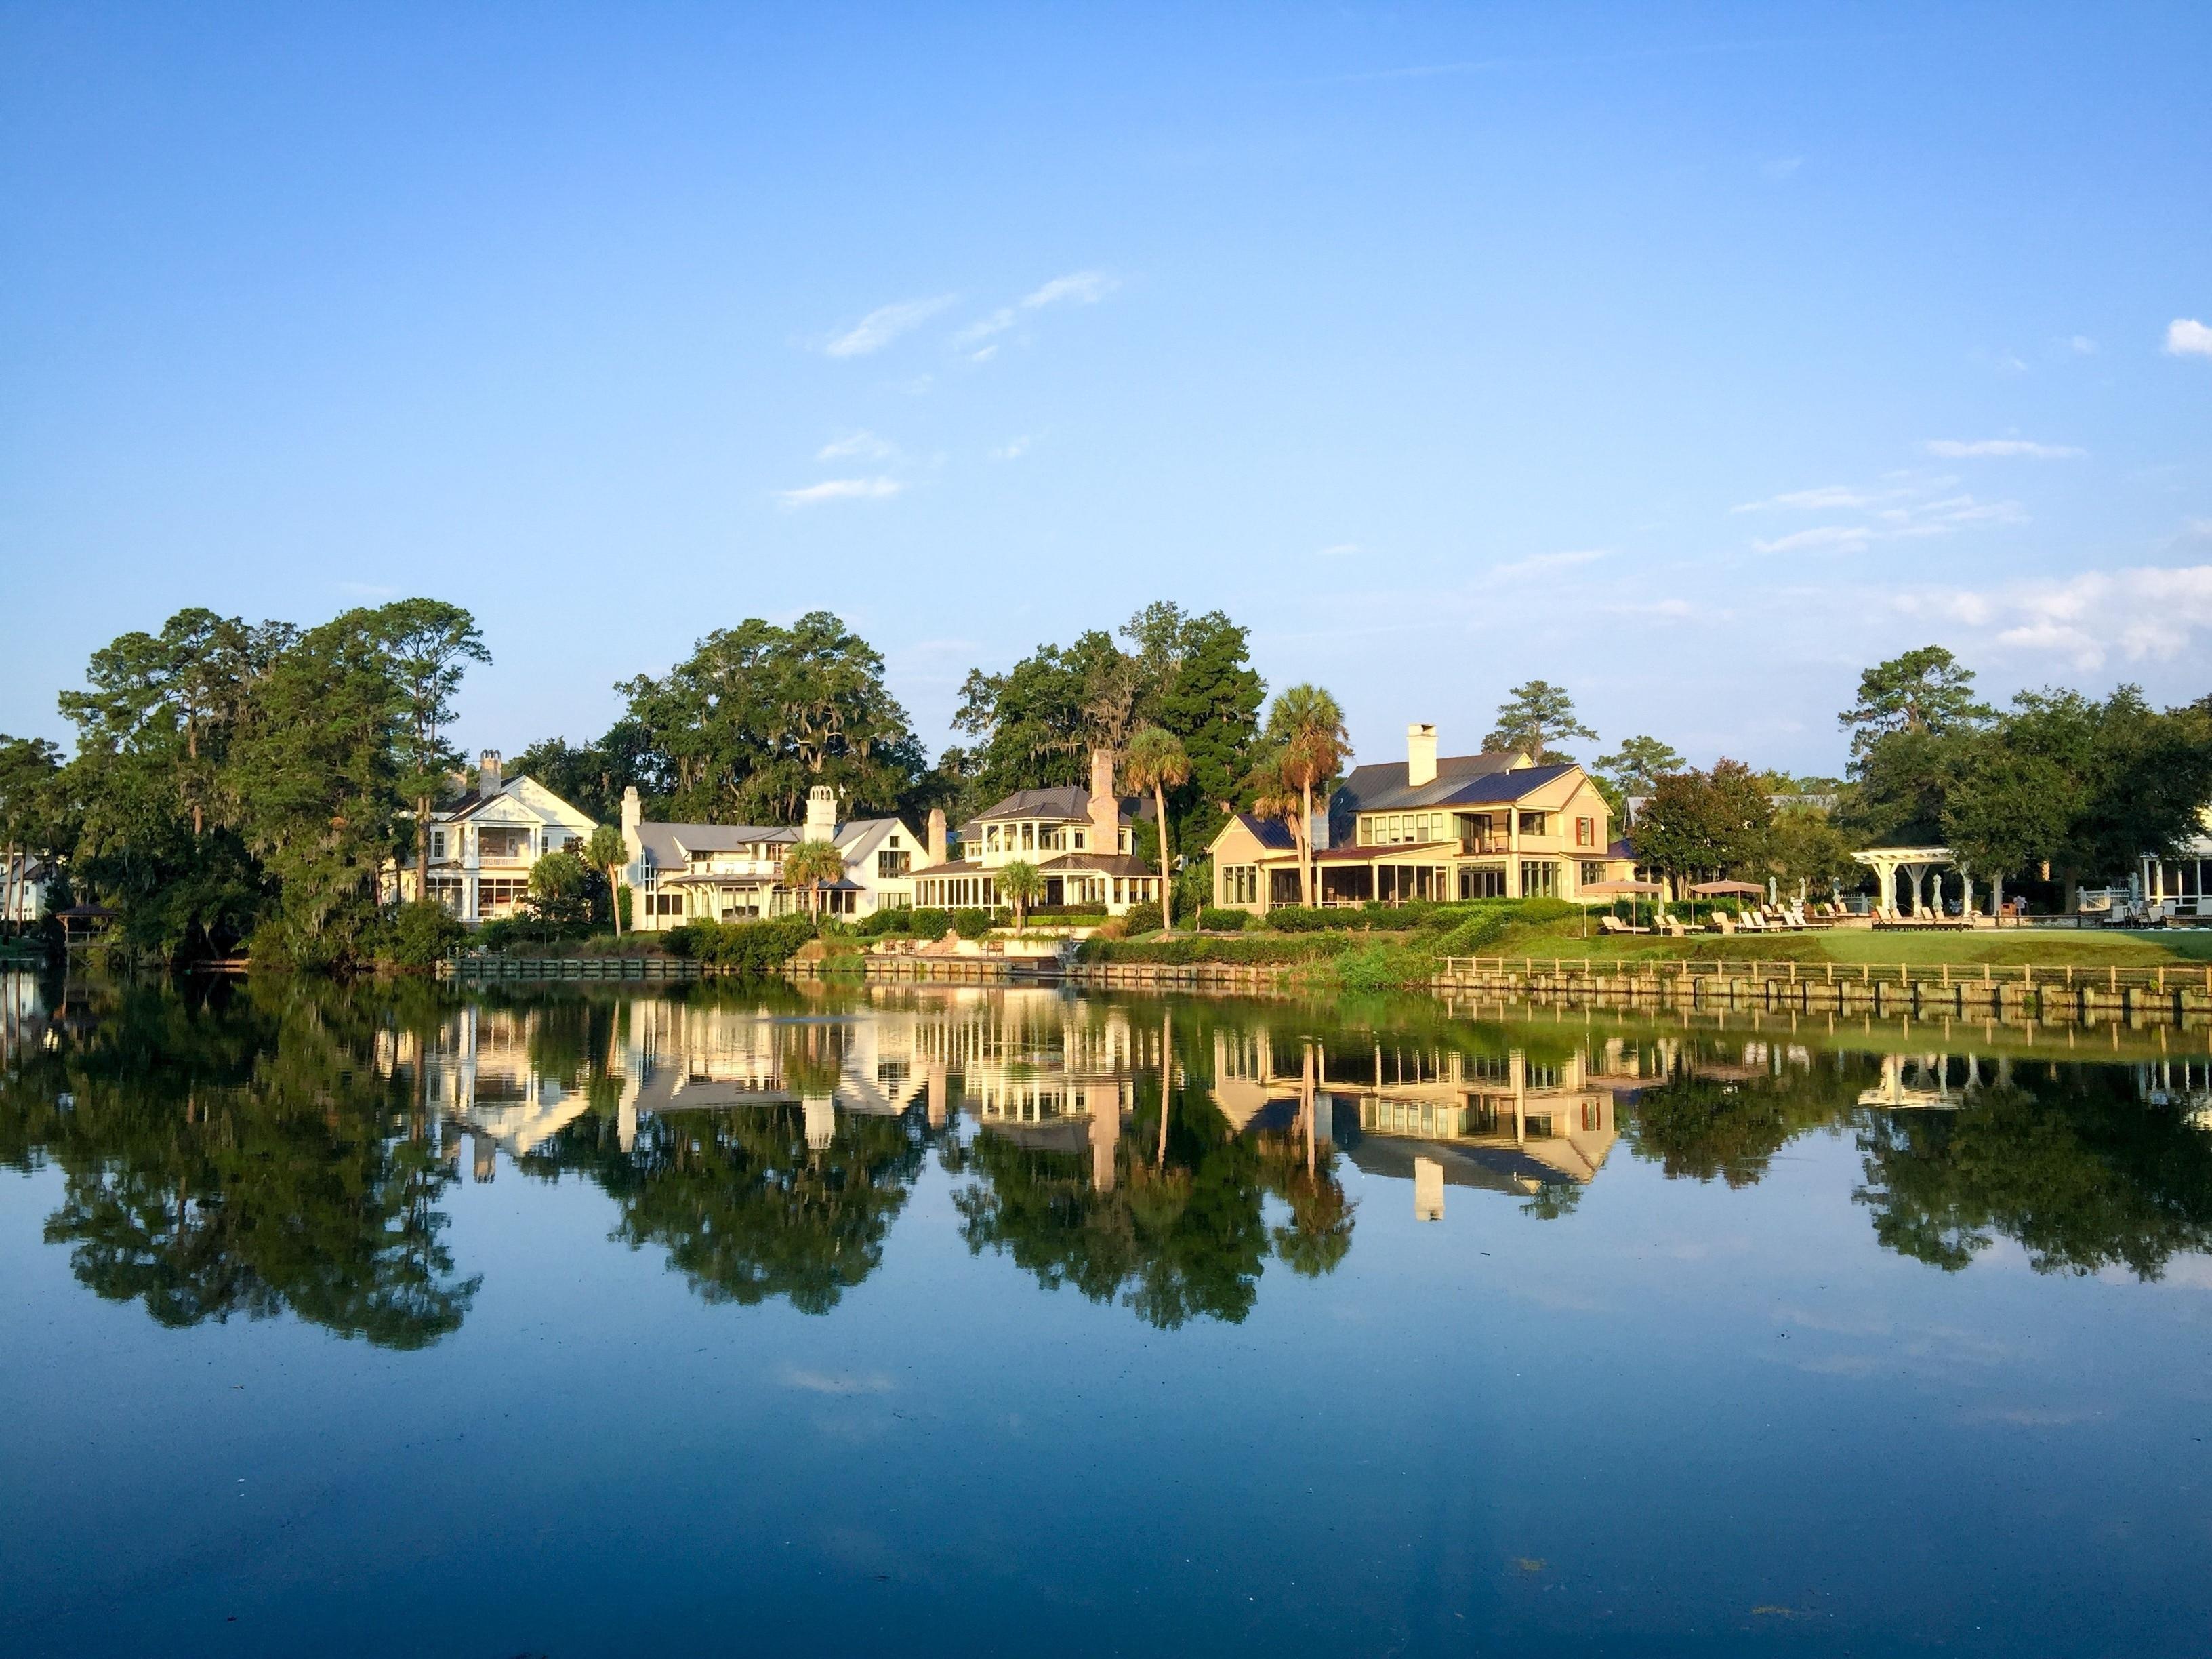 Bluffton, South Carolina, USA